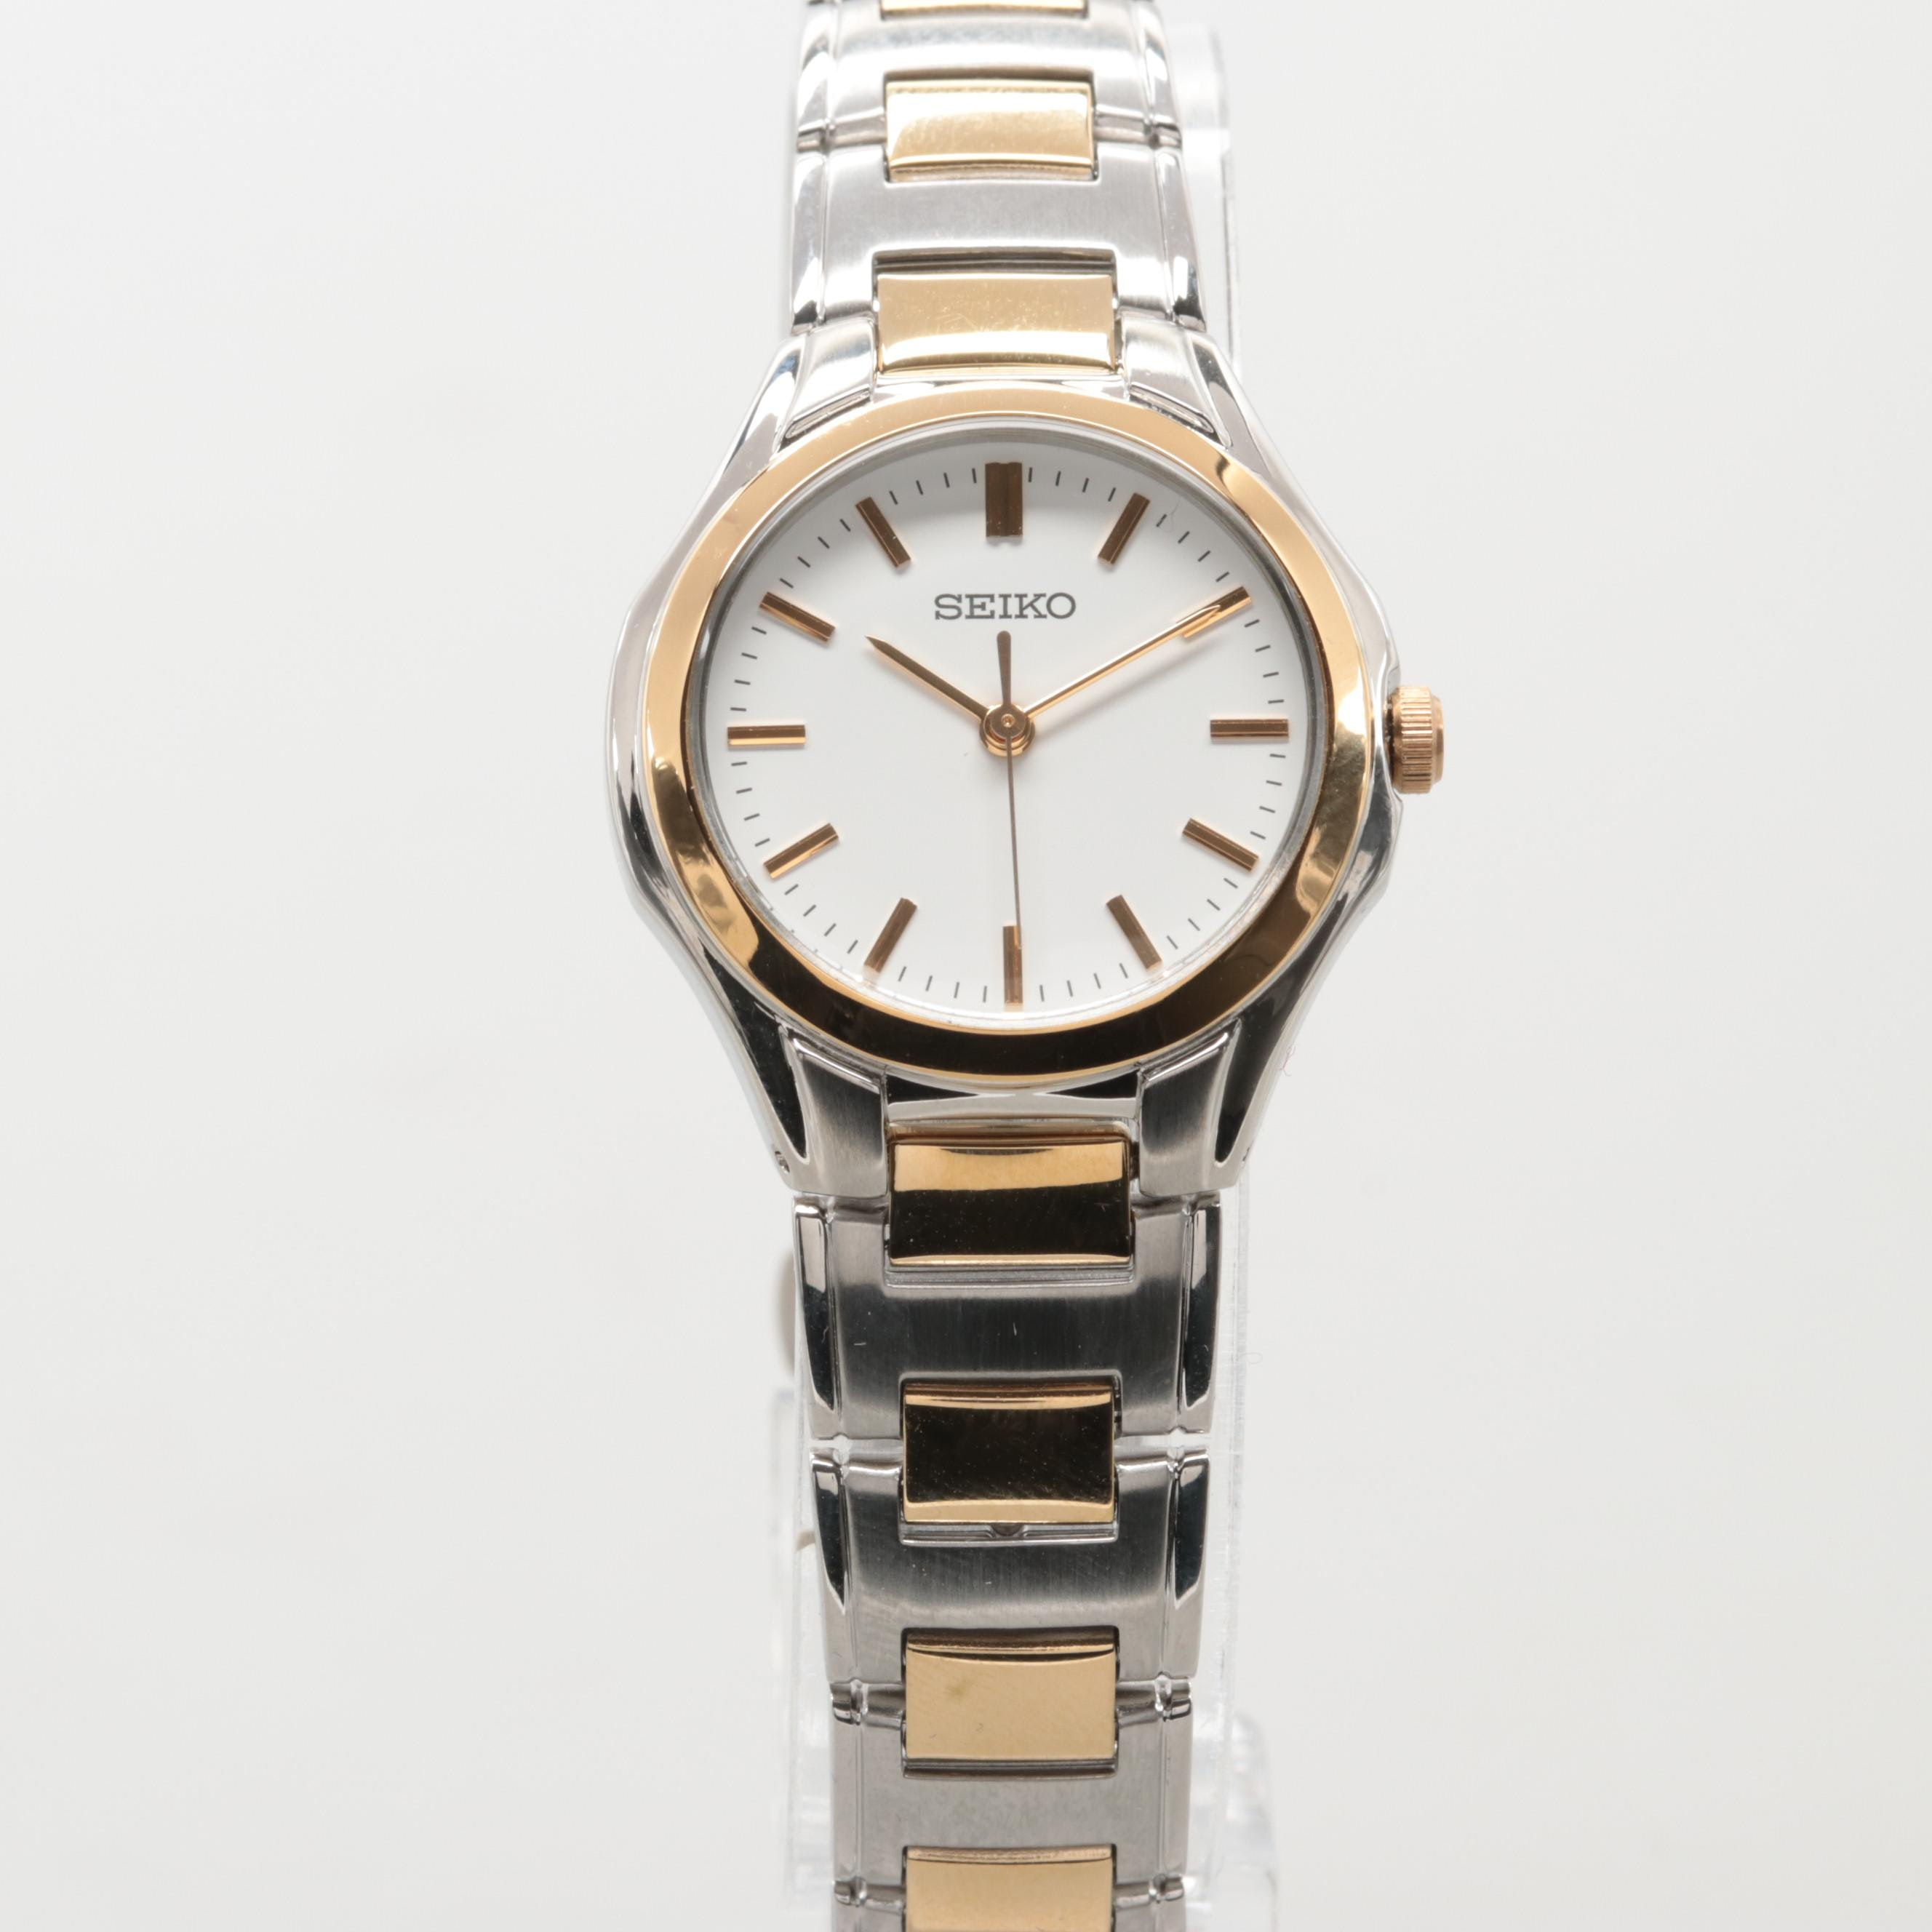 Seiko Model SRZ58PI Two-Tone Quartz Wristwatch